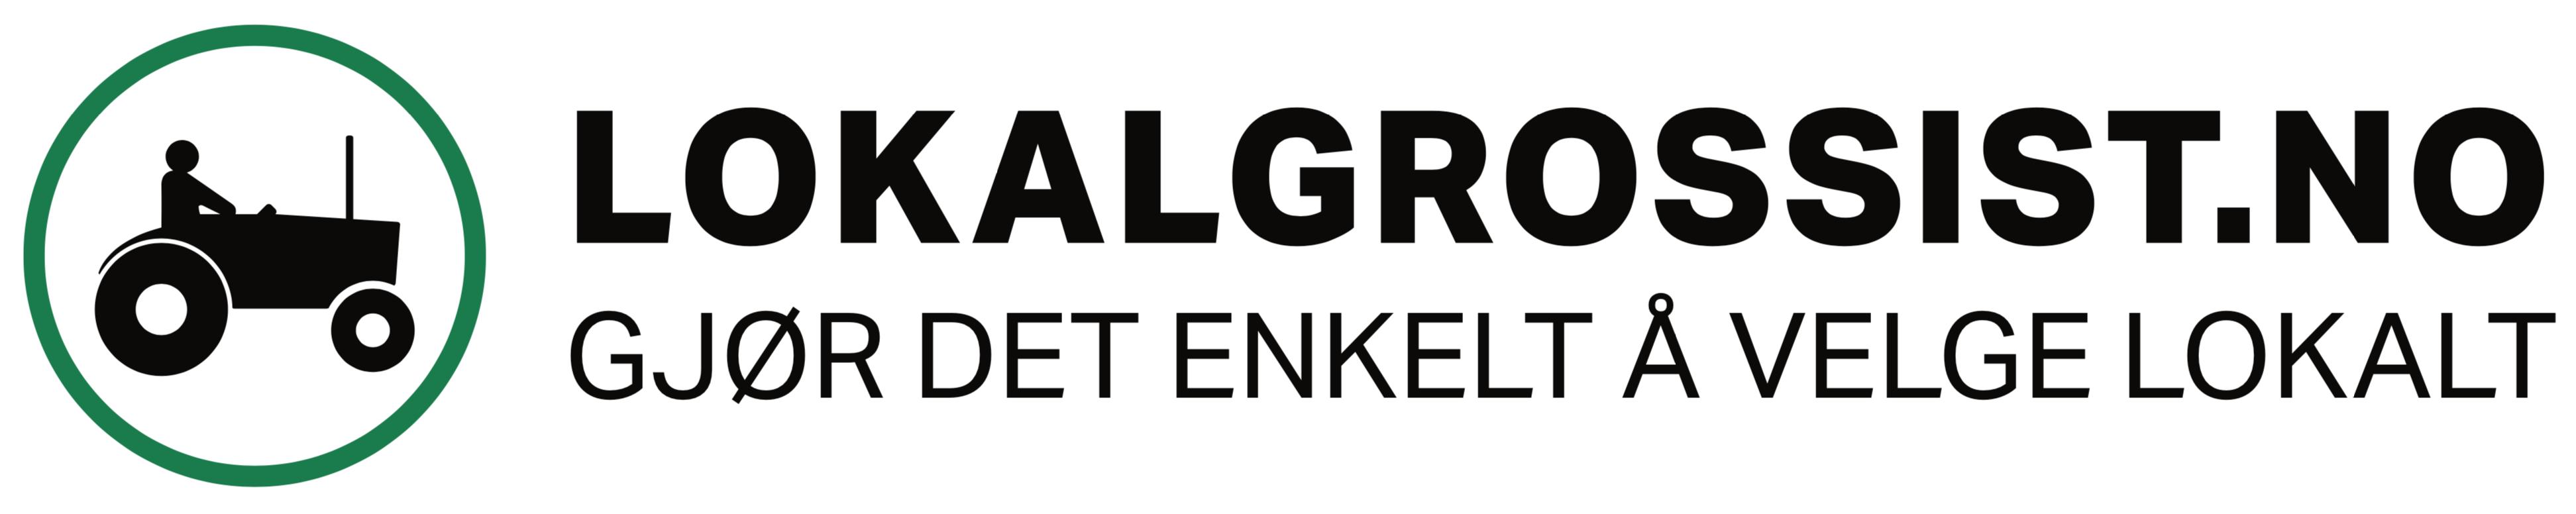 LOKALGROSSIST_Logo_big